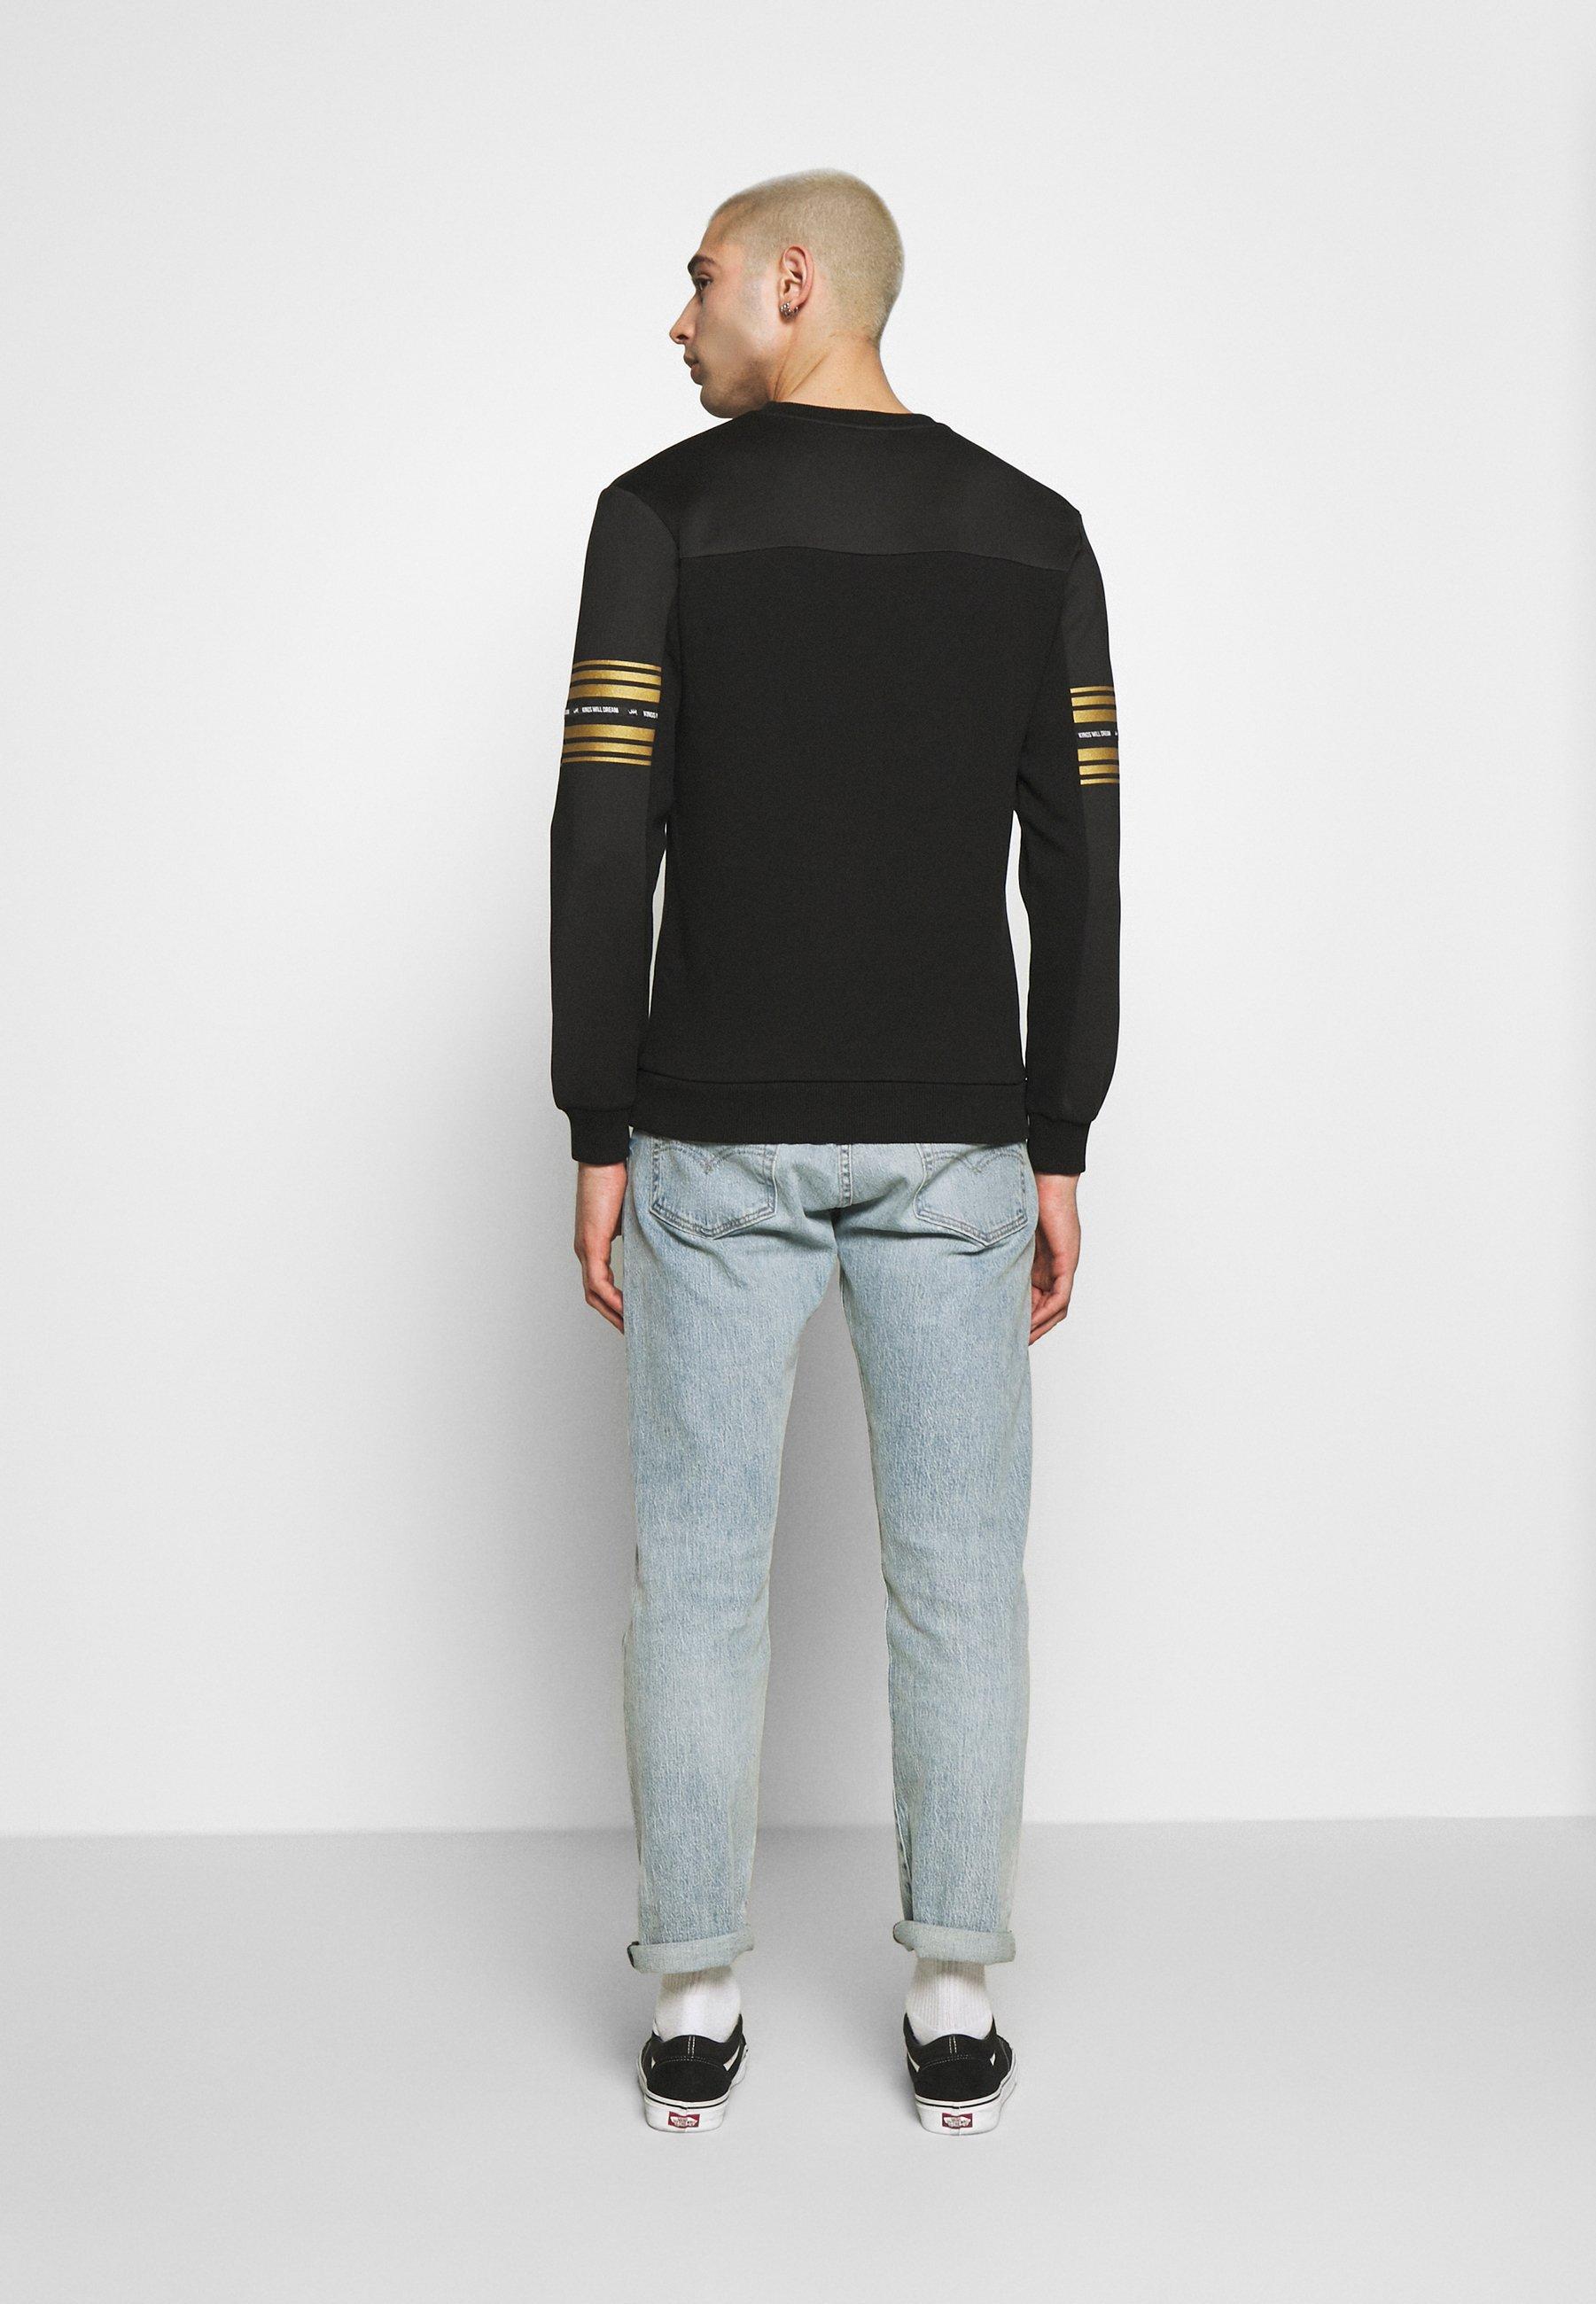 Kings Will Dream Sweatshirt - black/gold